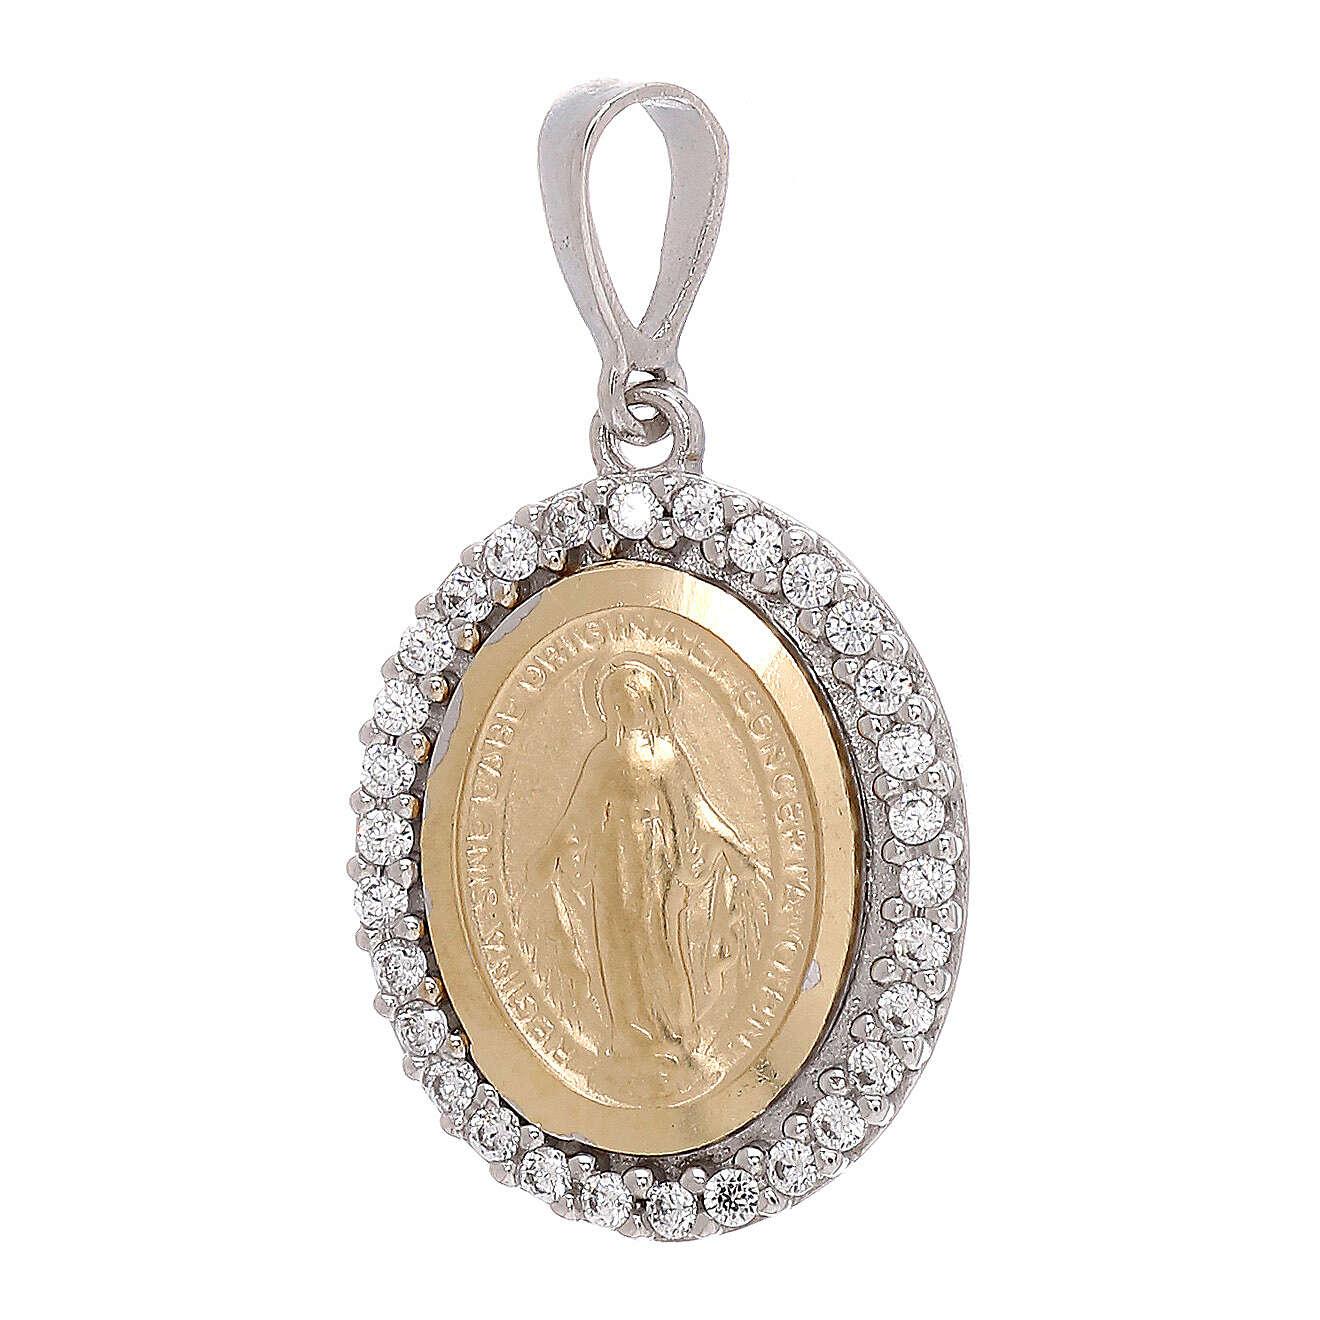 Colgante Virgen Milagrosa bicolor oro 18 k Swarovski 2,5 gramos 4